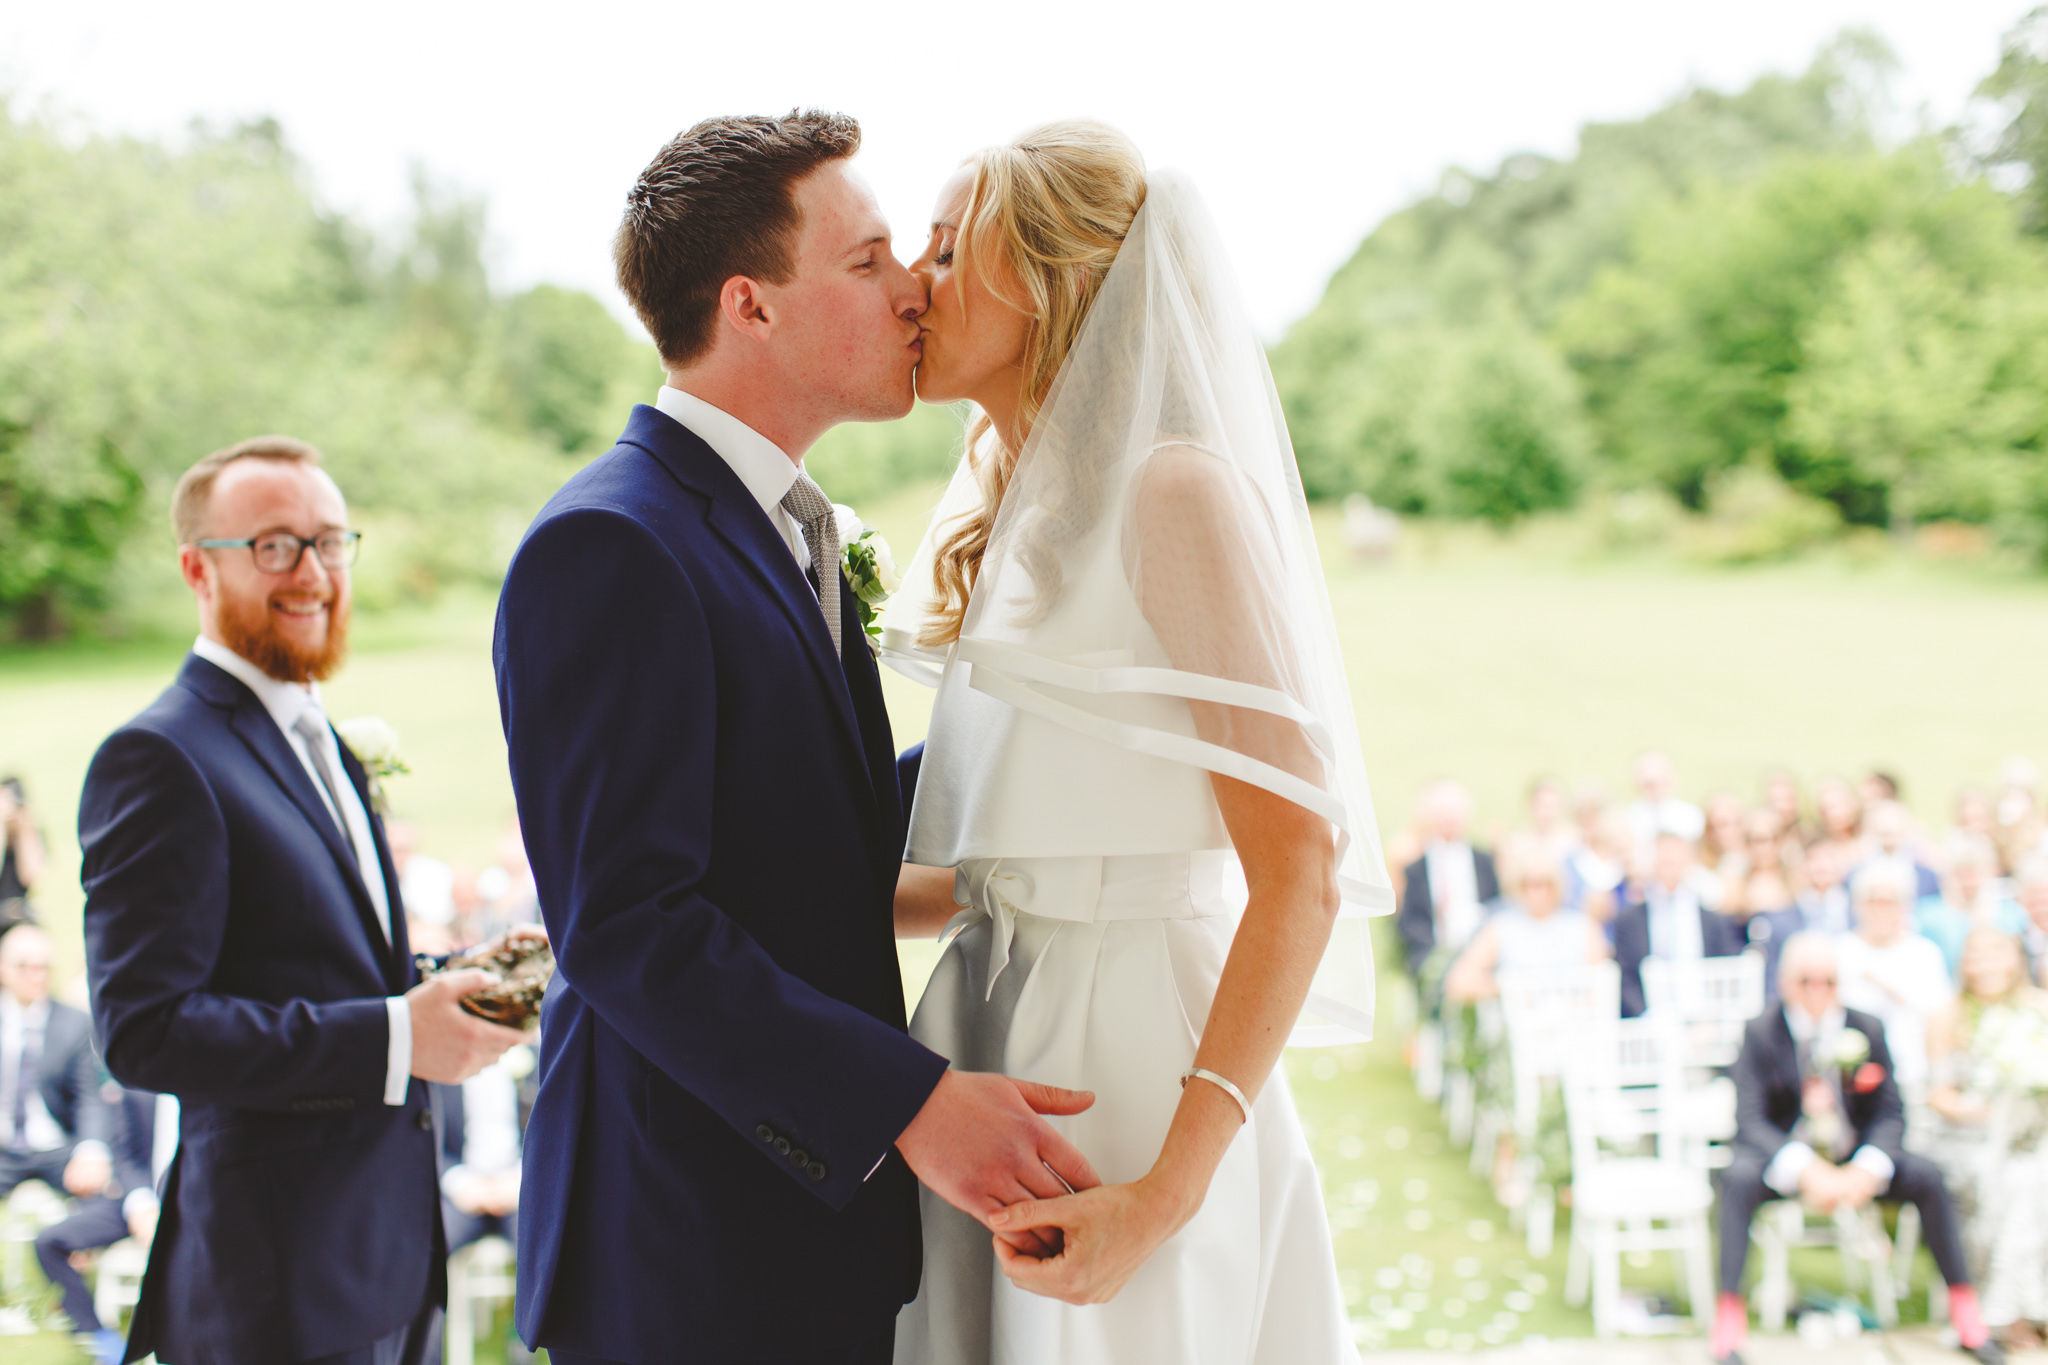 derbyshire-wedding-photographer-videographer-camera-hannah-75.jpg